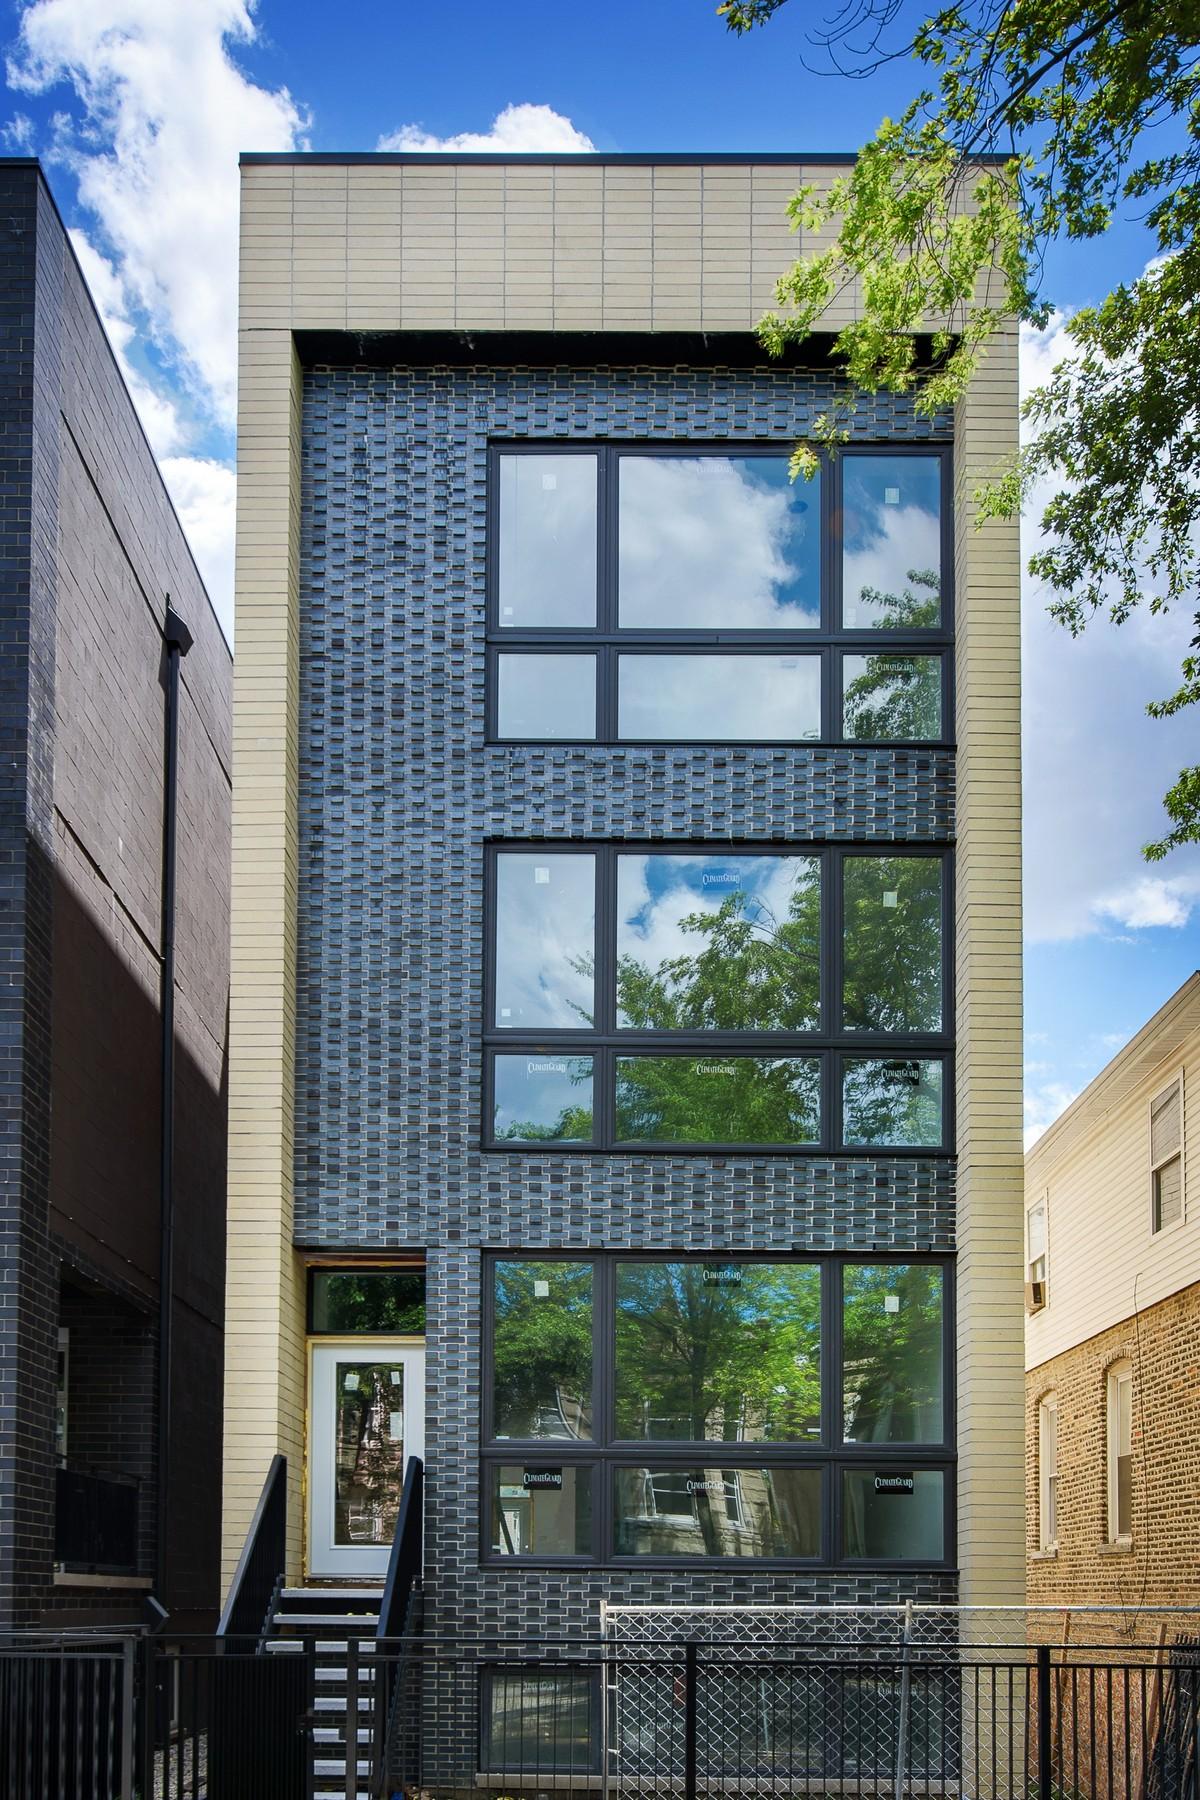 复式单位 为 销售 在 Spacious Duplex in Three Unit New Construction Building 2441 W Haddon Avenue Unit 1 West Town, 芝加哥, 伊利诺斯州, 60622 美国